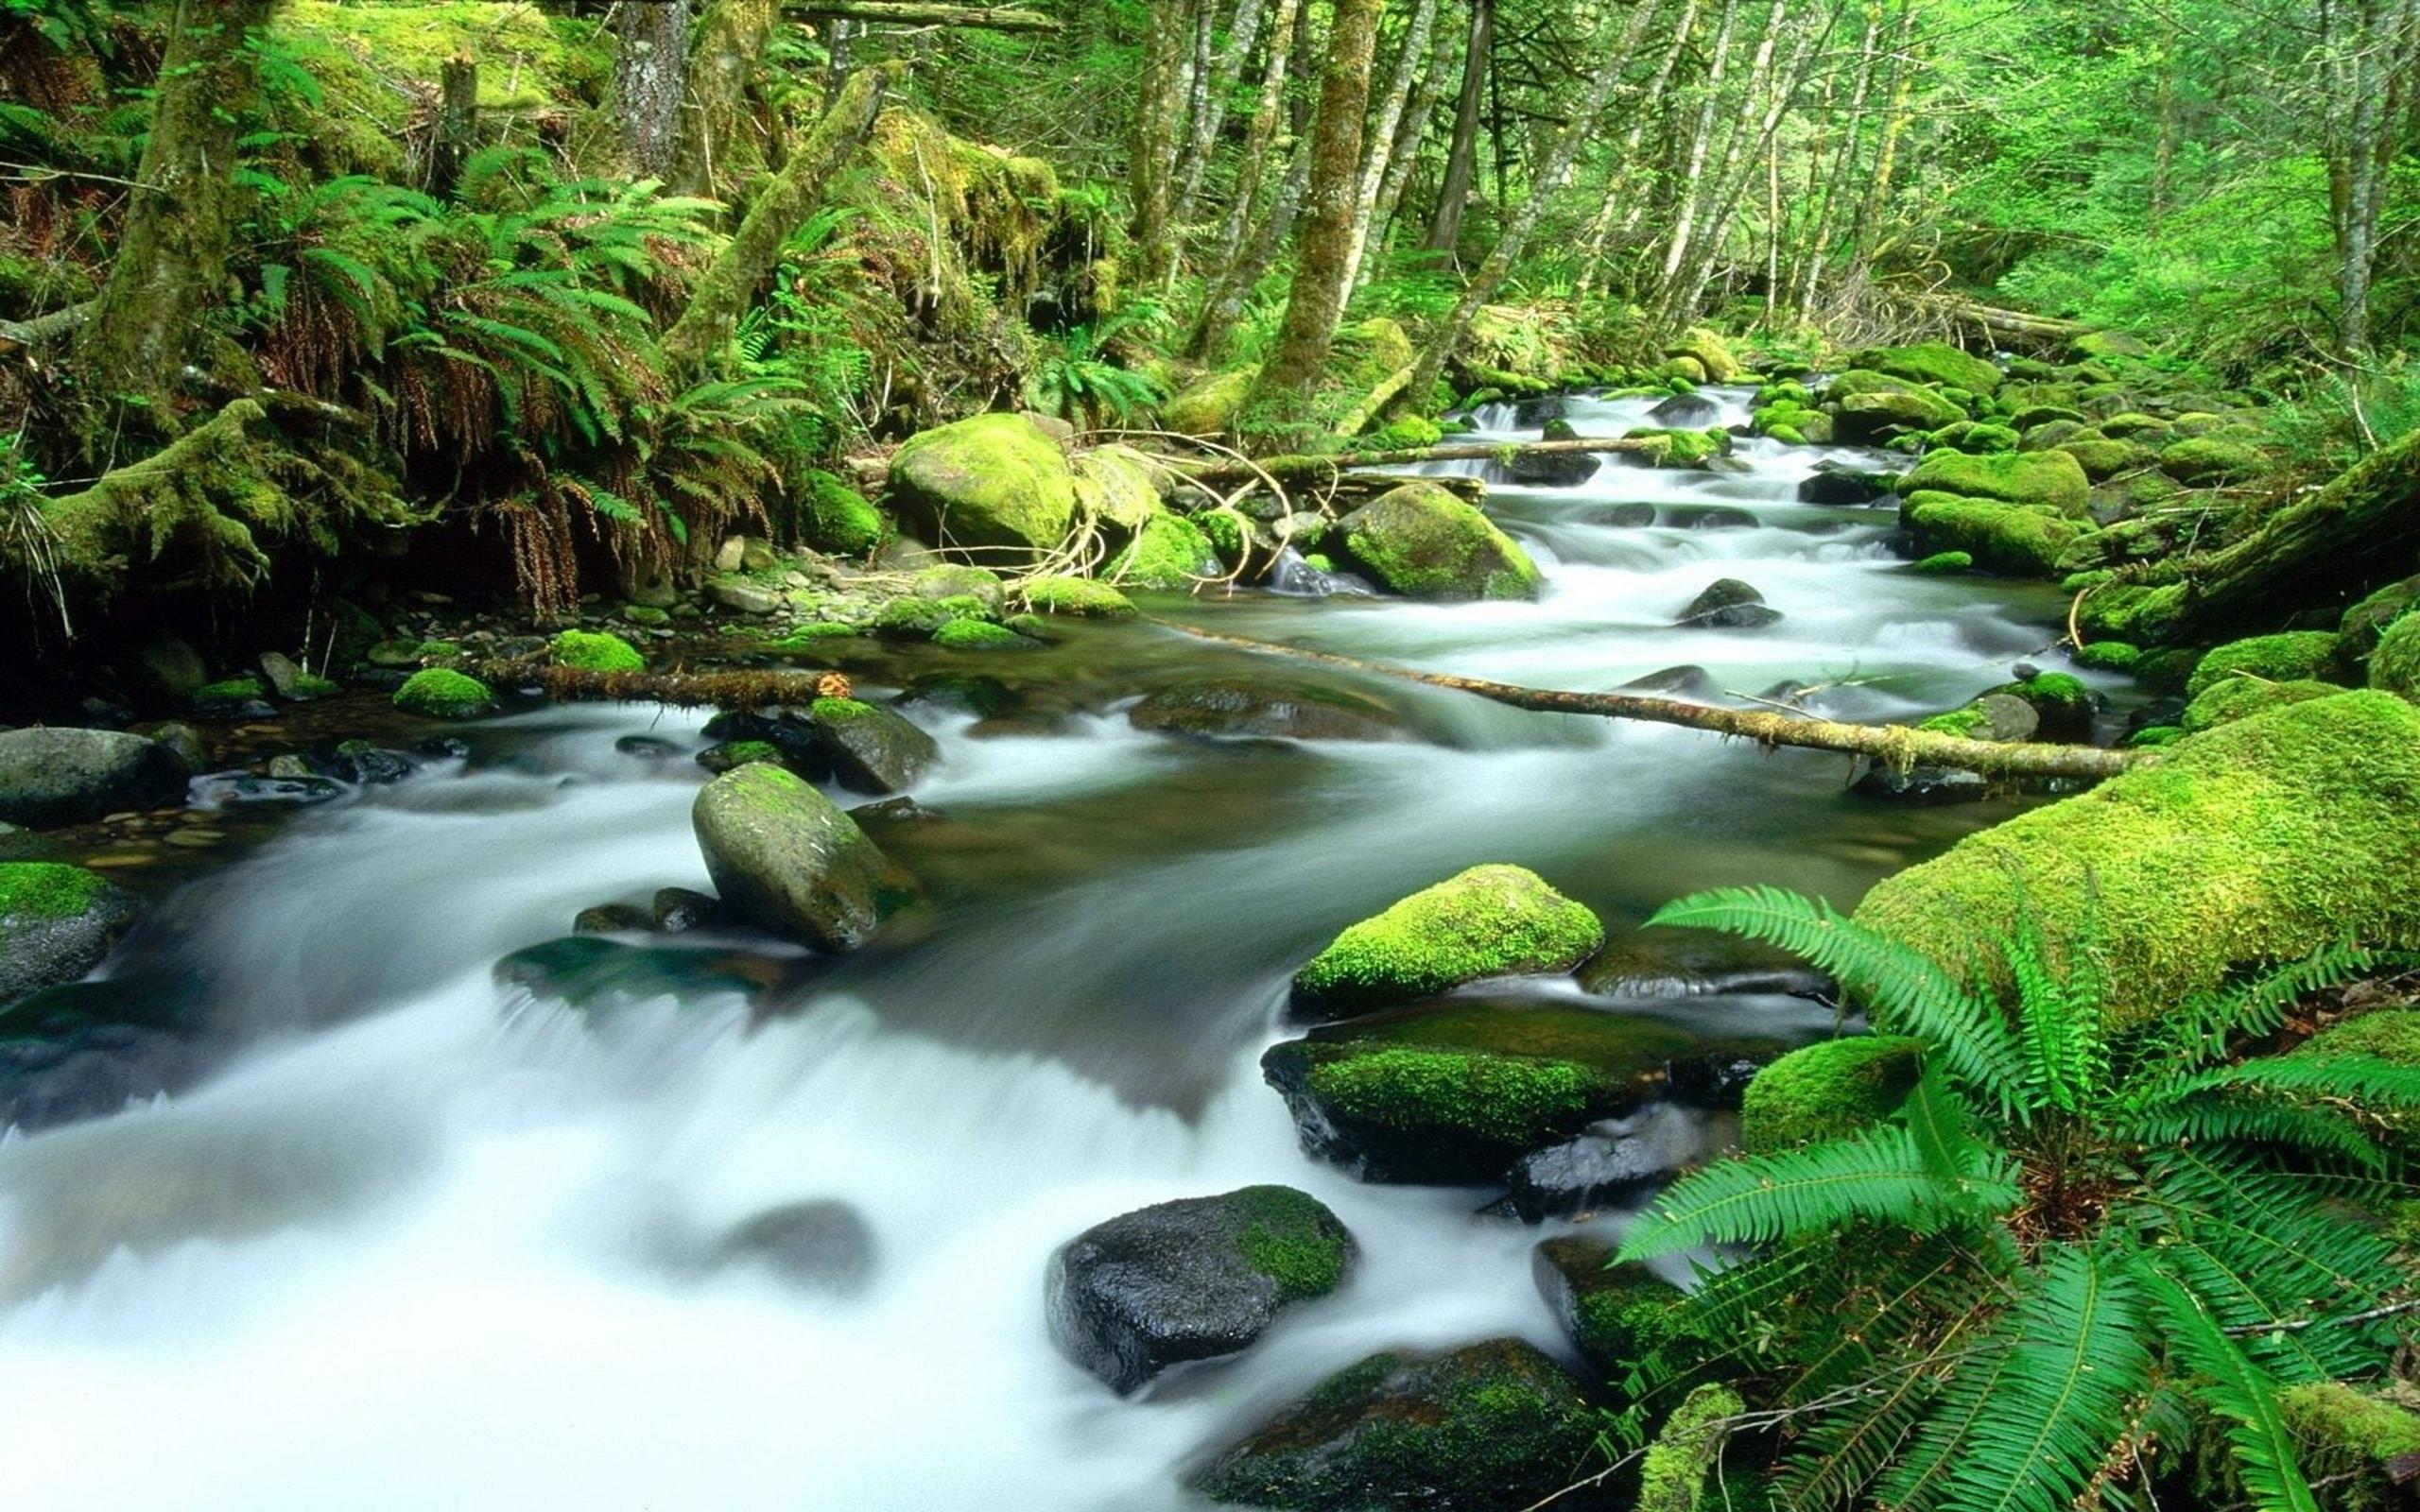 Mystic Falls Wallpaper Earth Daintree Rainforest Forest Beautiful Scenery